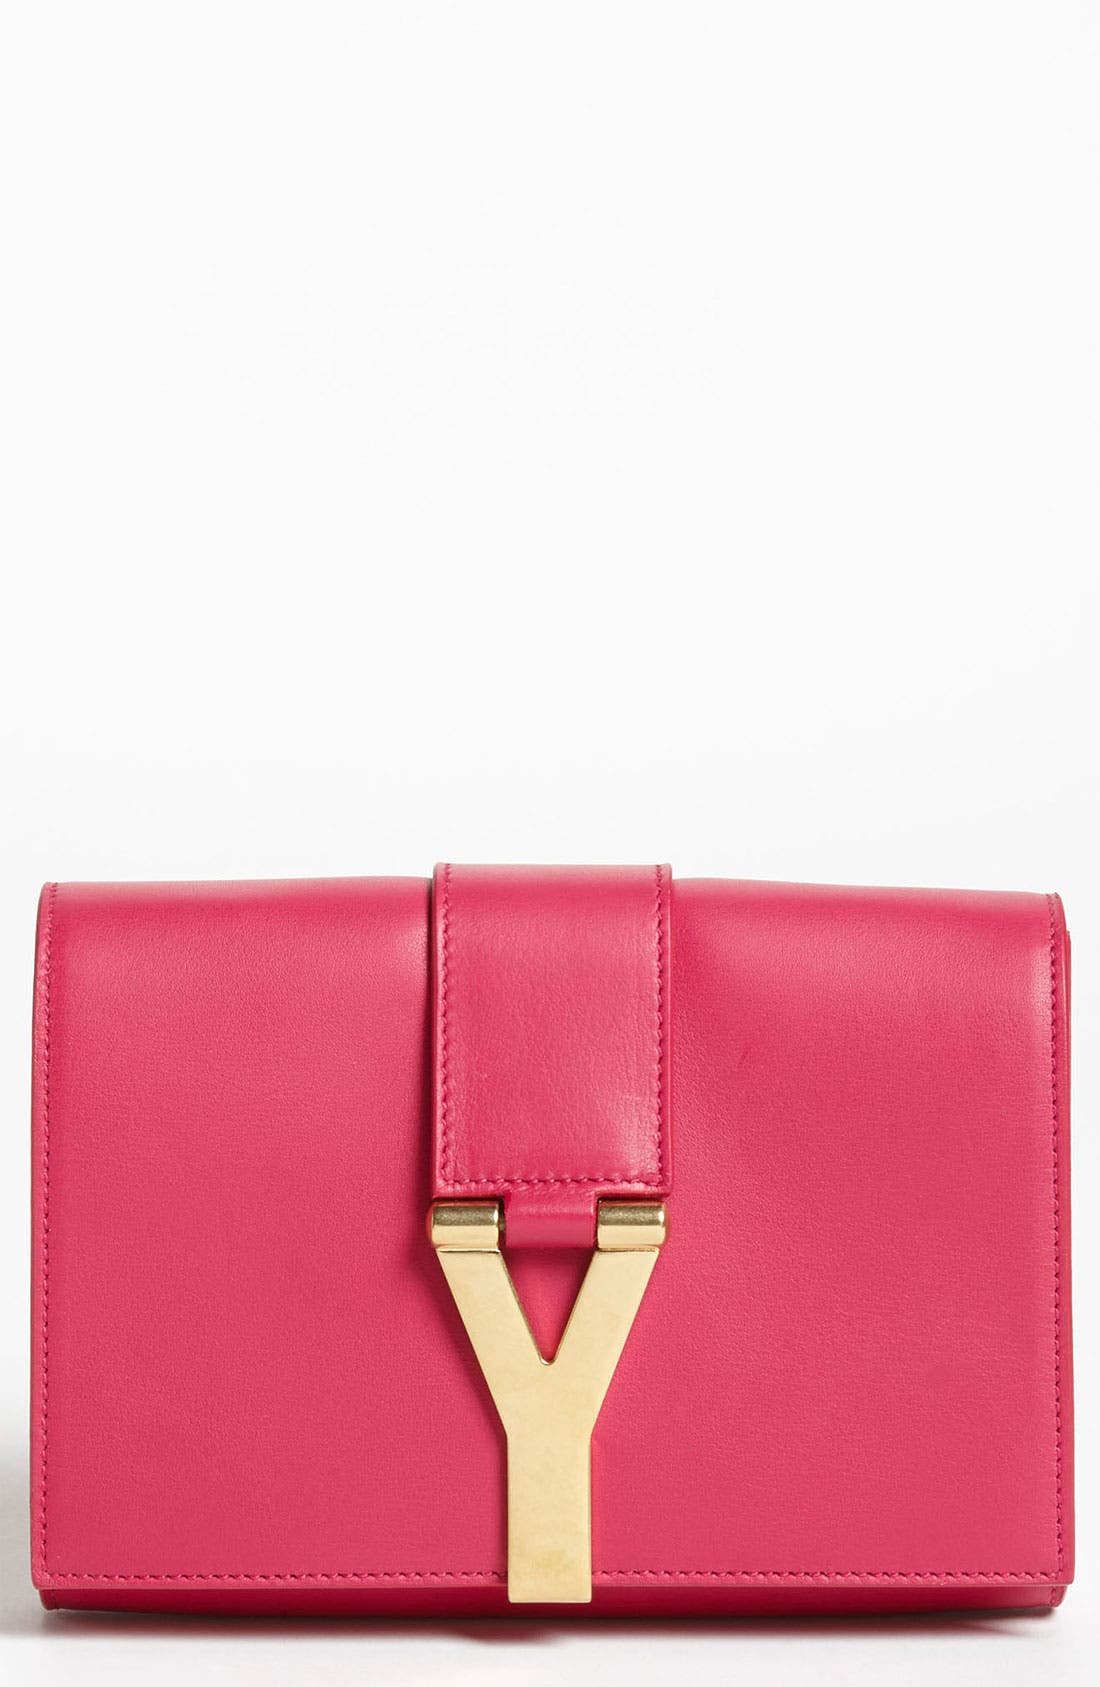 Alternate Image 1 Selected - Saint Laurent 'Y Chain - Mini' Leather Handbag